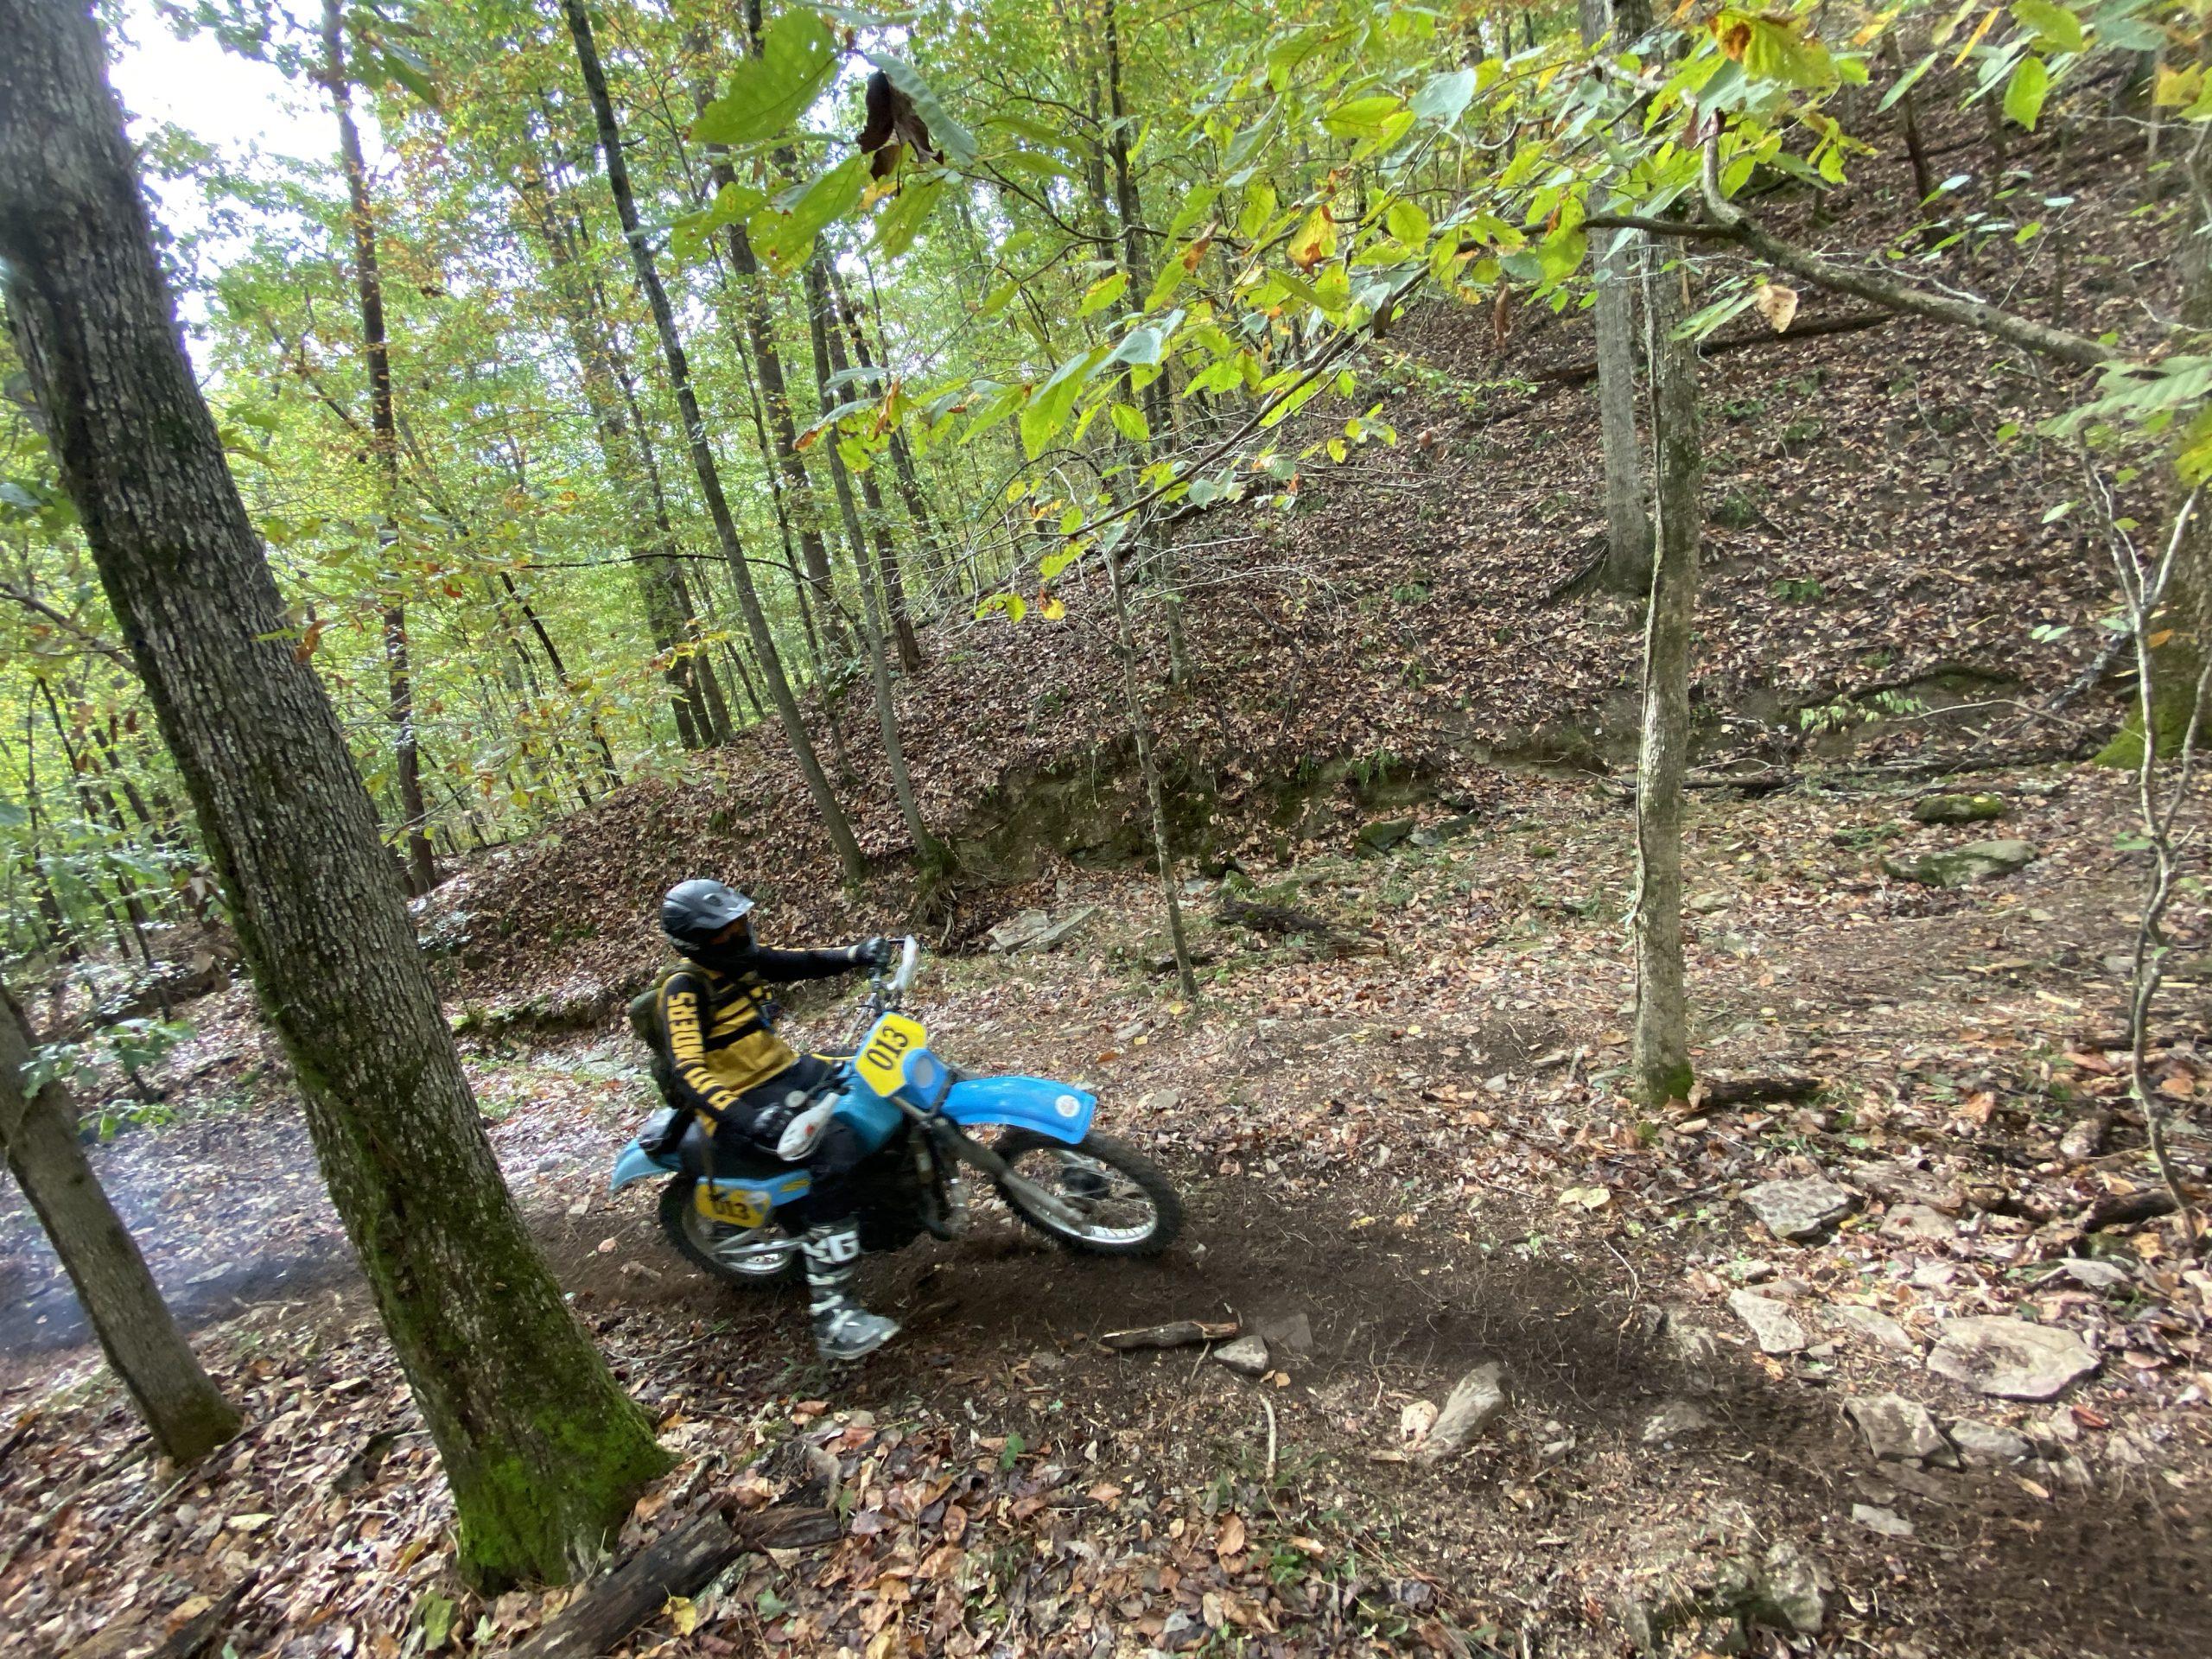 2019 Barber Vintage Festival Moto Rider Rips Trail Corner